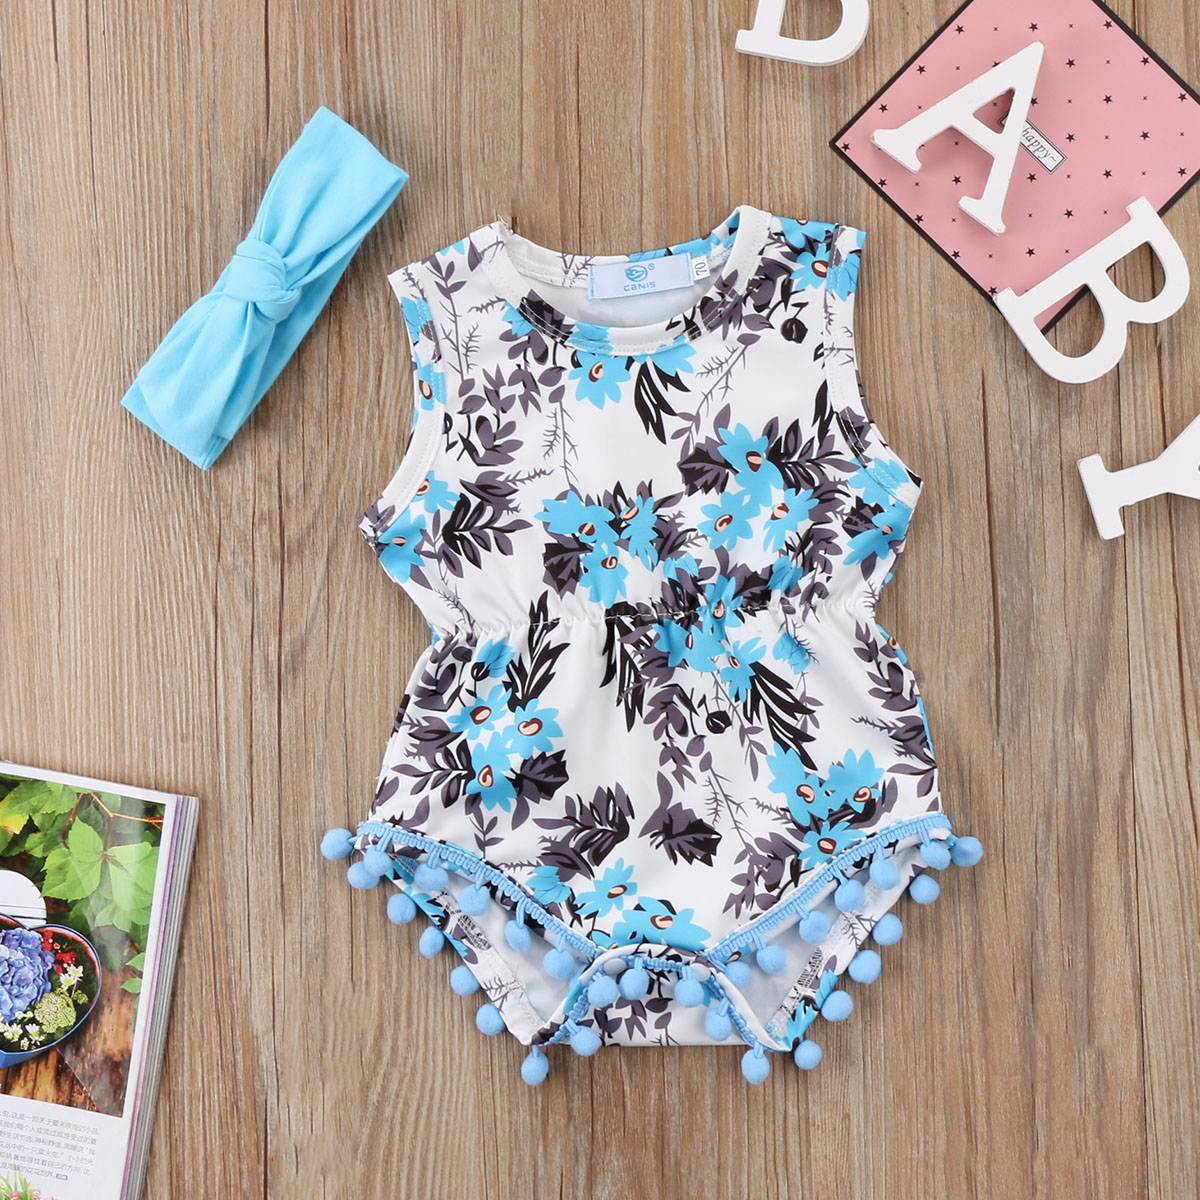 Newborn Infant Baby Kid Girls Clothes Floral Romper Headband Jumpsuit Bohemian beach style Clothes Suit 0-24M